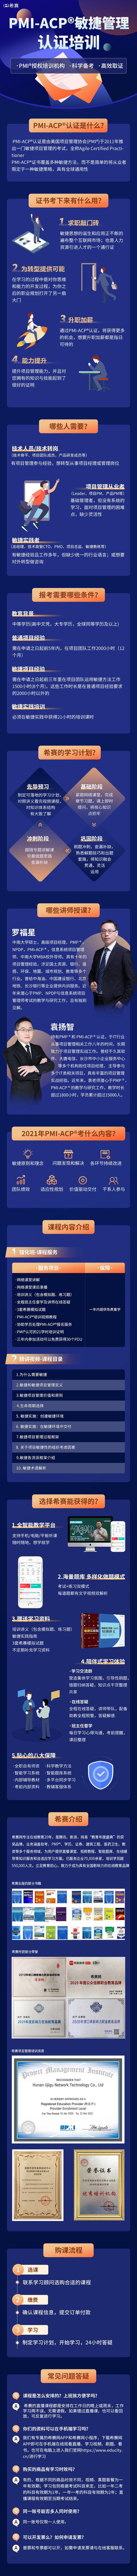 PMI-ACP<sup>®</sup>详情页.jpg